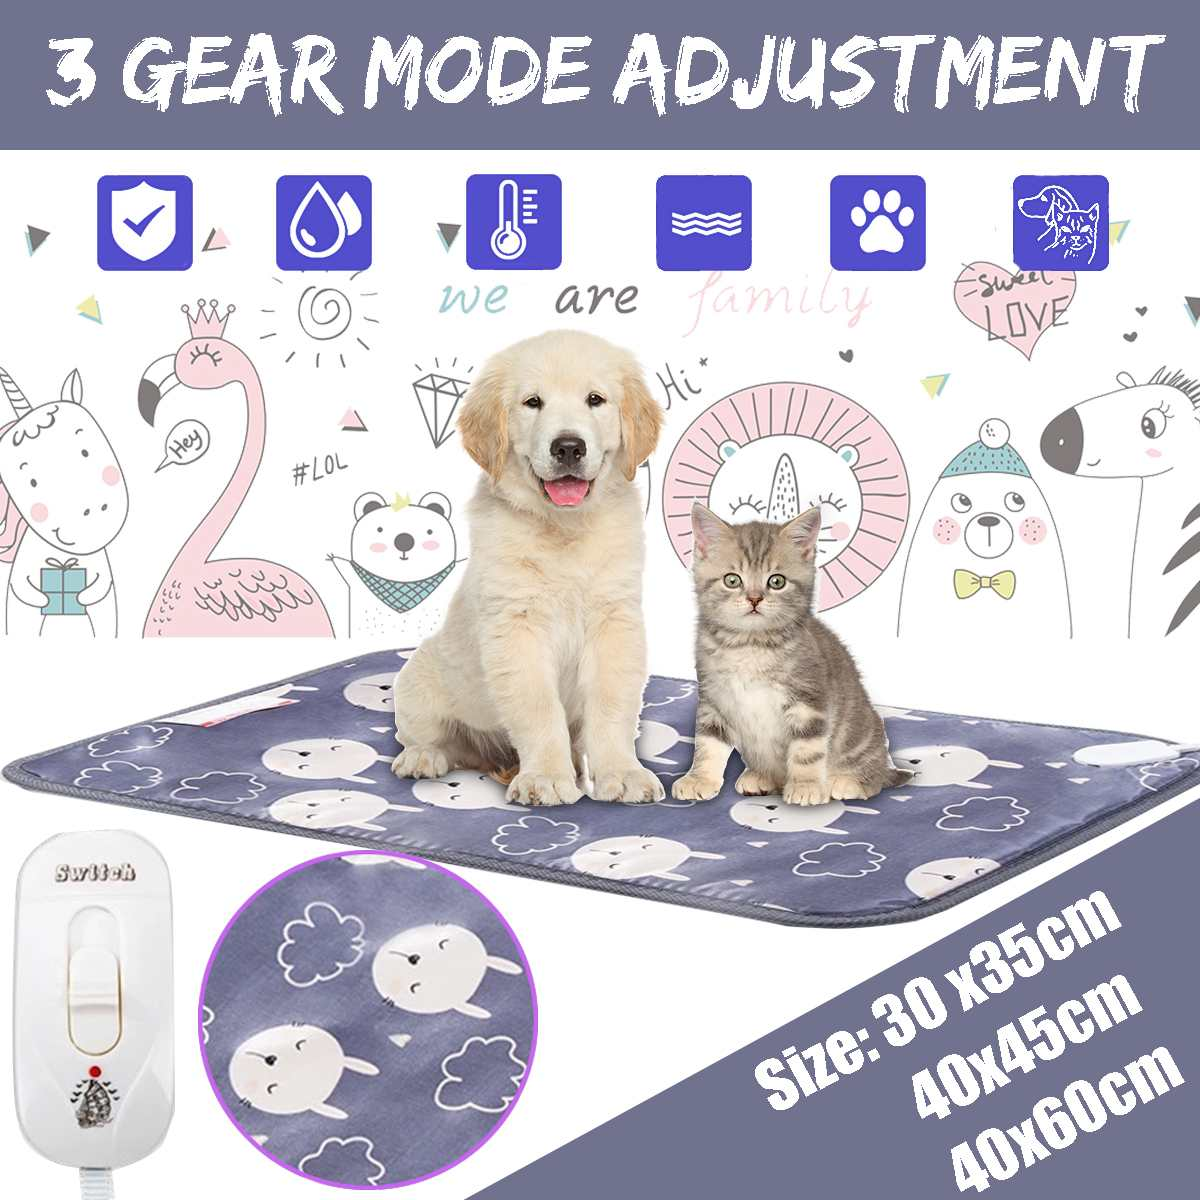 20W 220V Pet Dog Cat Warm Electric Heating Pad  Waterproof Heating Pad Three-speed Thermostat Pet Winter Plush Bed Carpet Mat